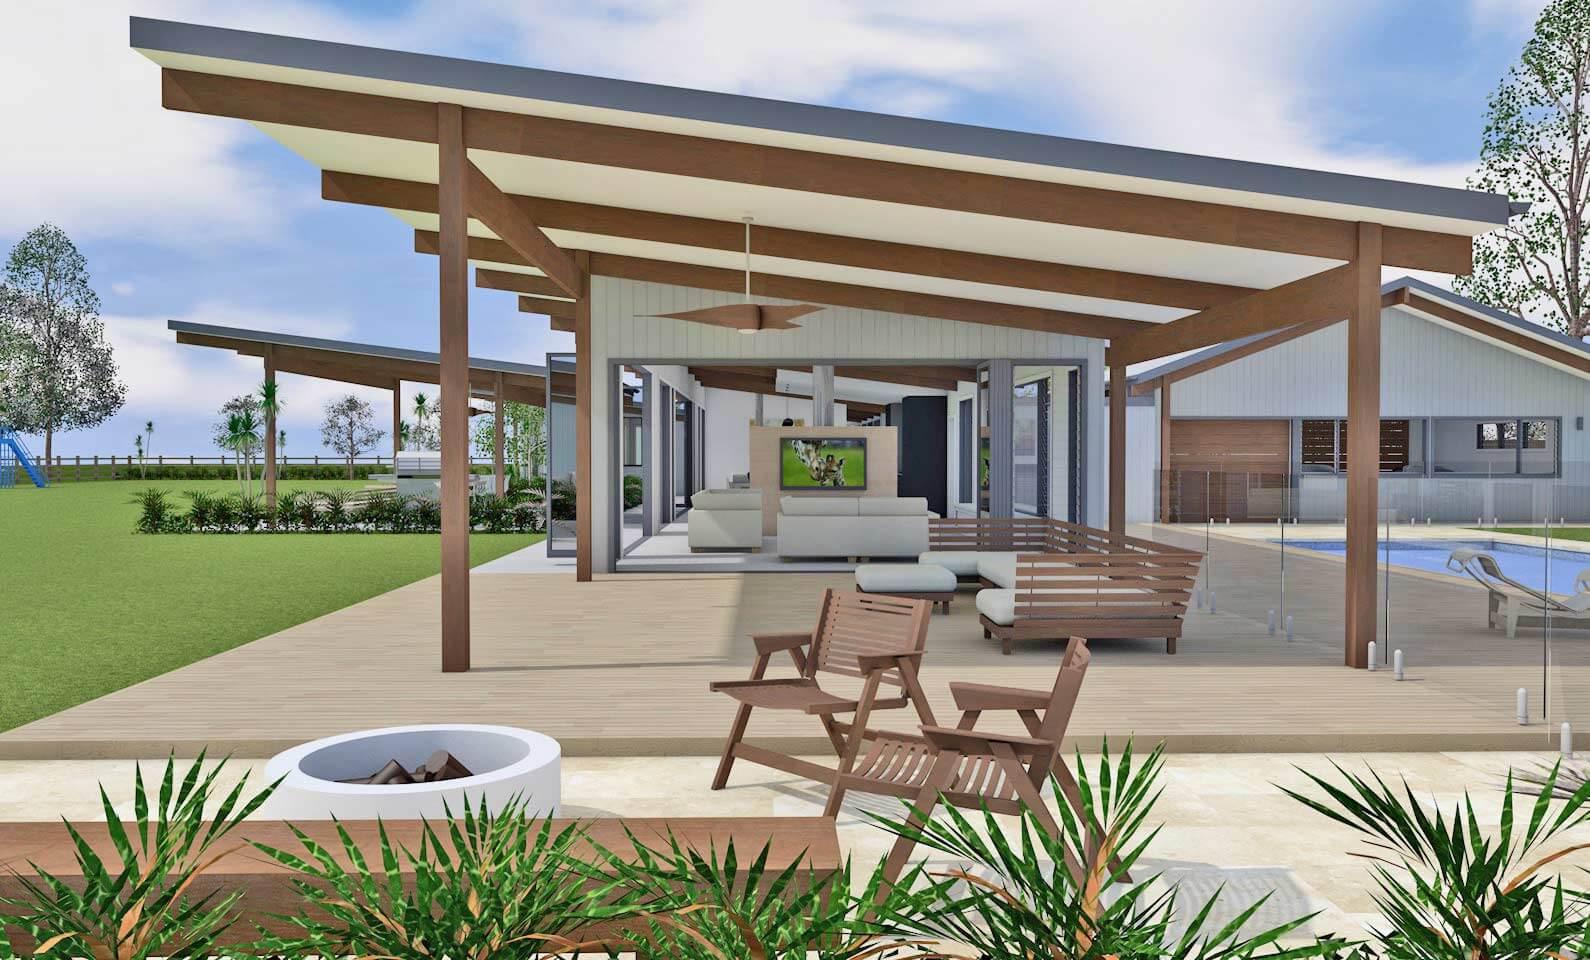 Architect design 3d concept vintage house hunter valley for Pavillion home designs australia